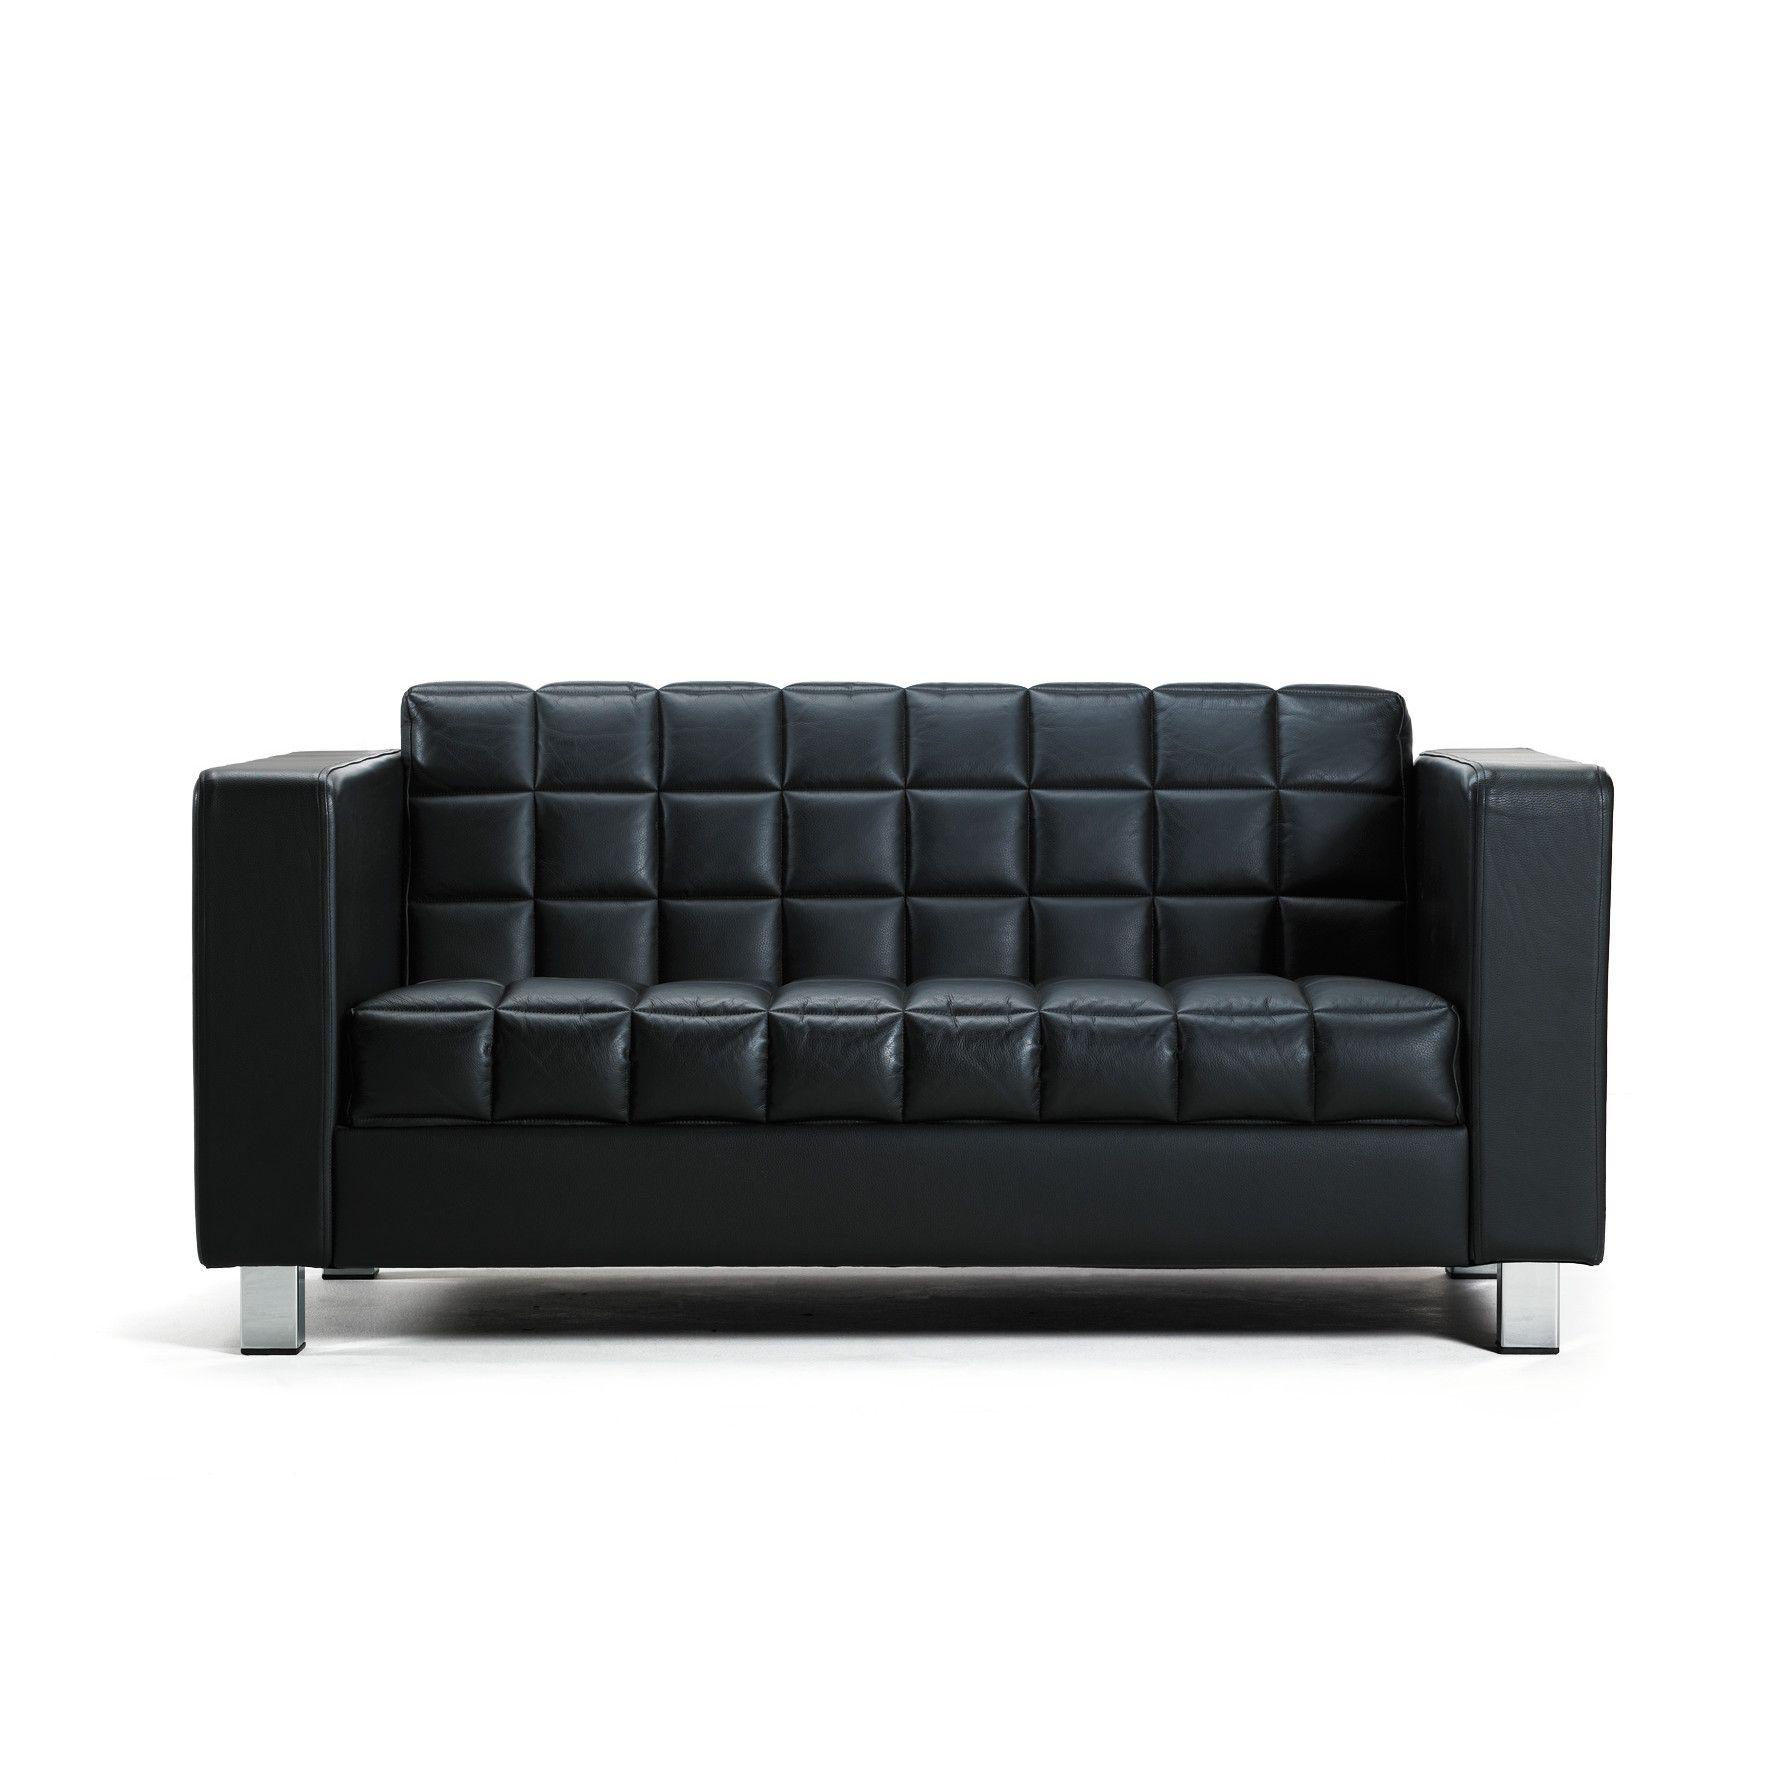 Fusion 10 Paint Pot 2 Seater Sofa Sofa Buy Sofa Online 2